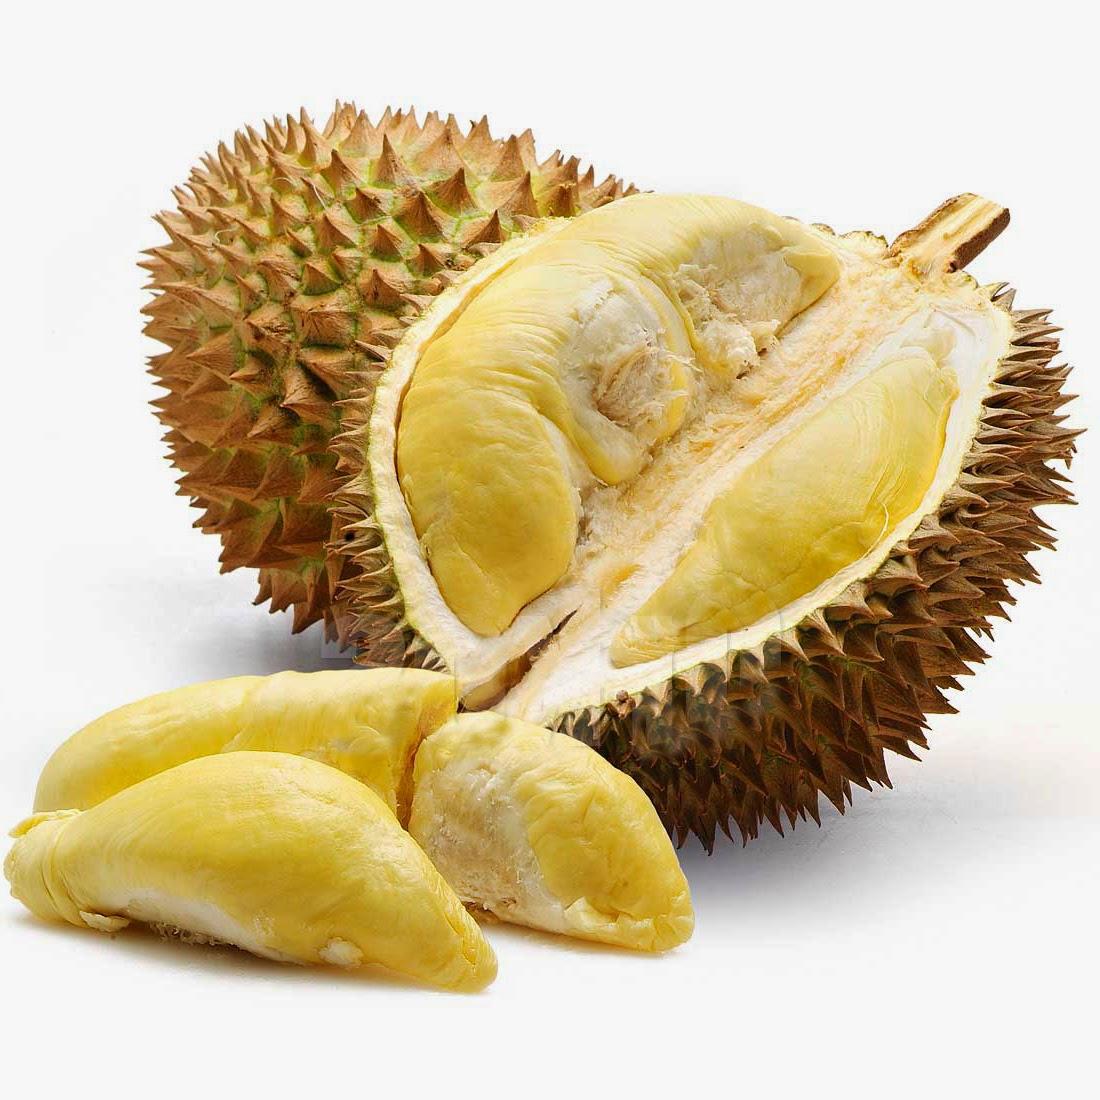 Kelezatan Terbaik dari Durian